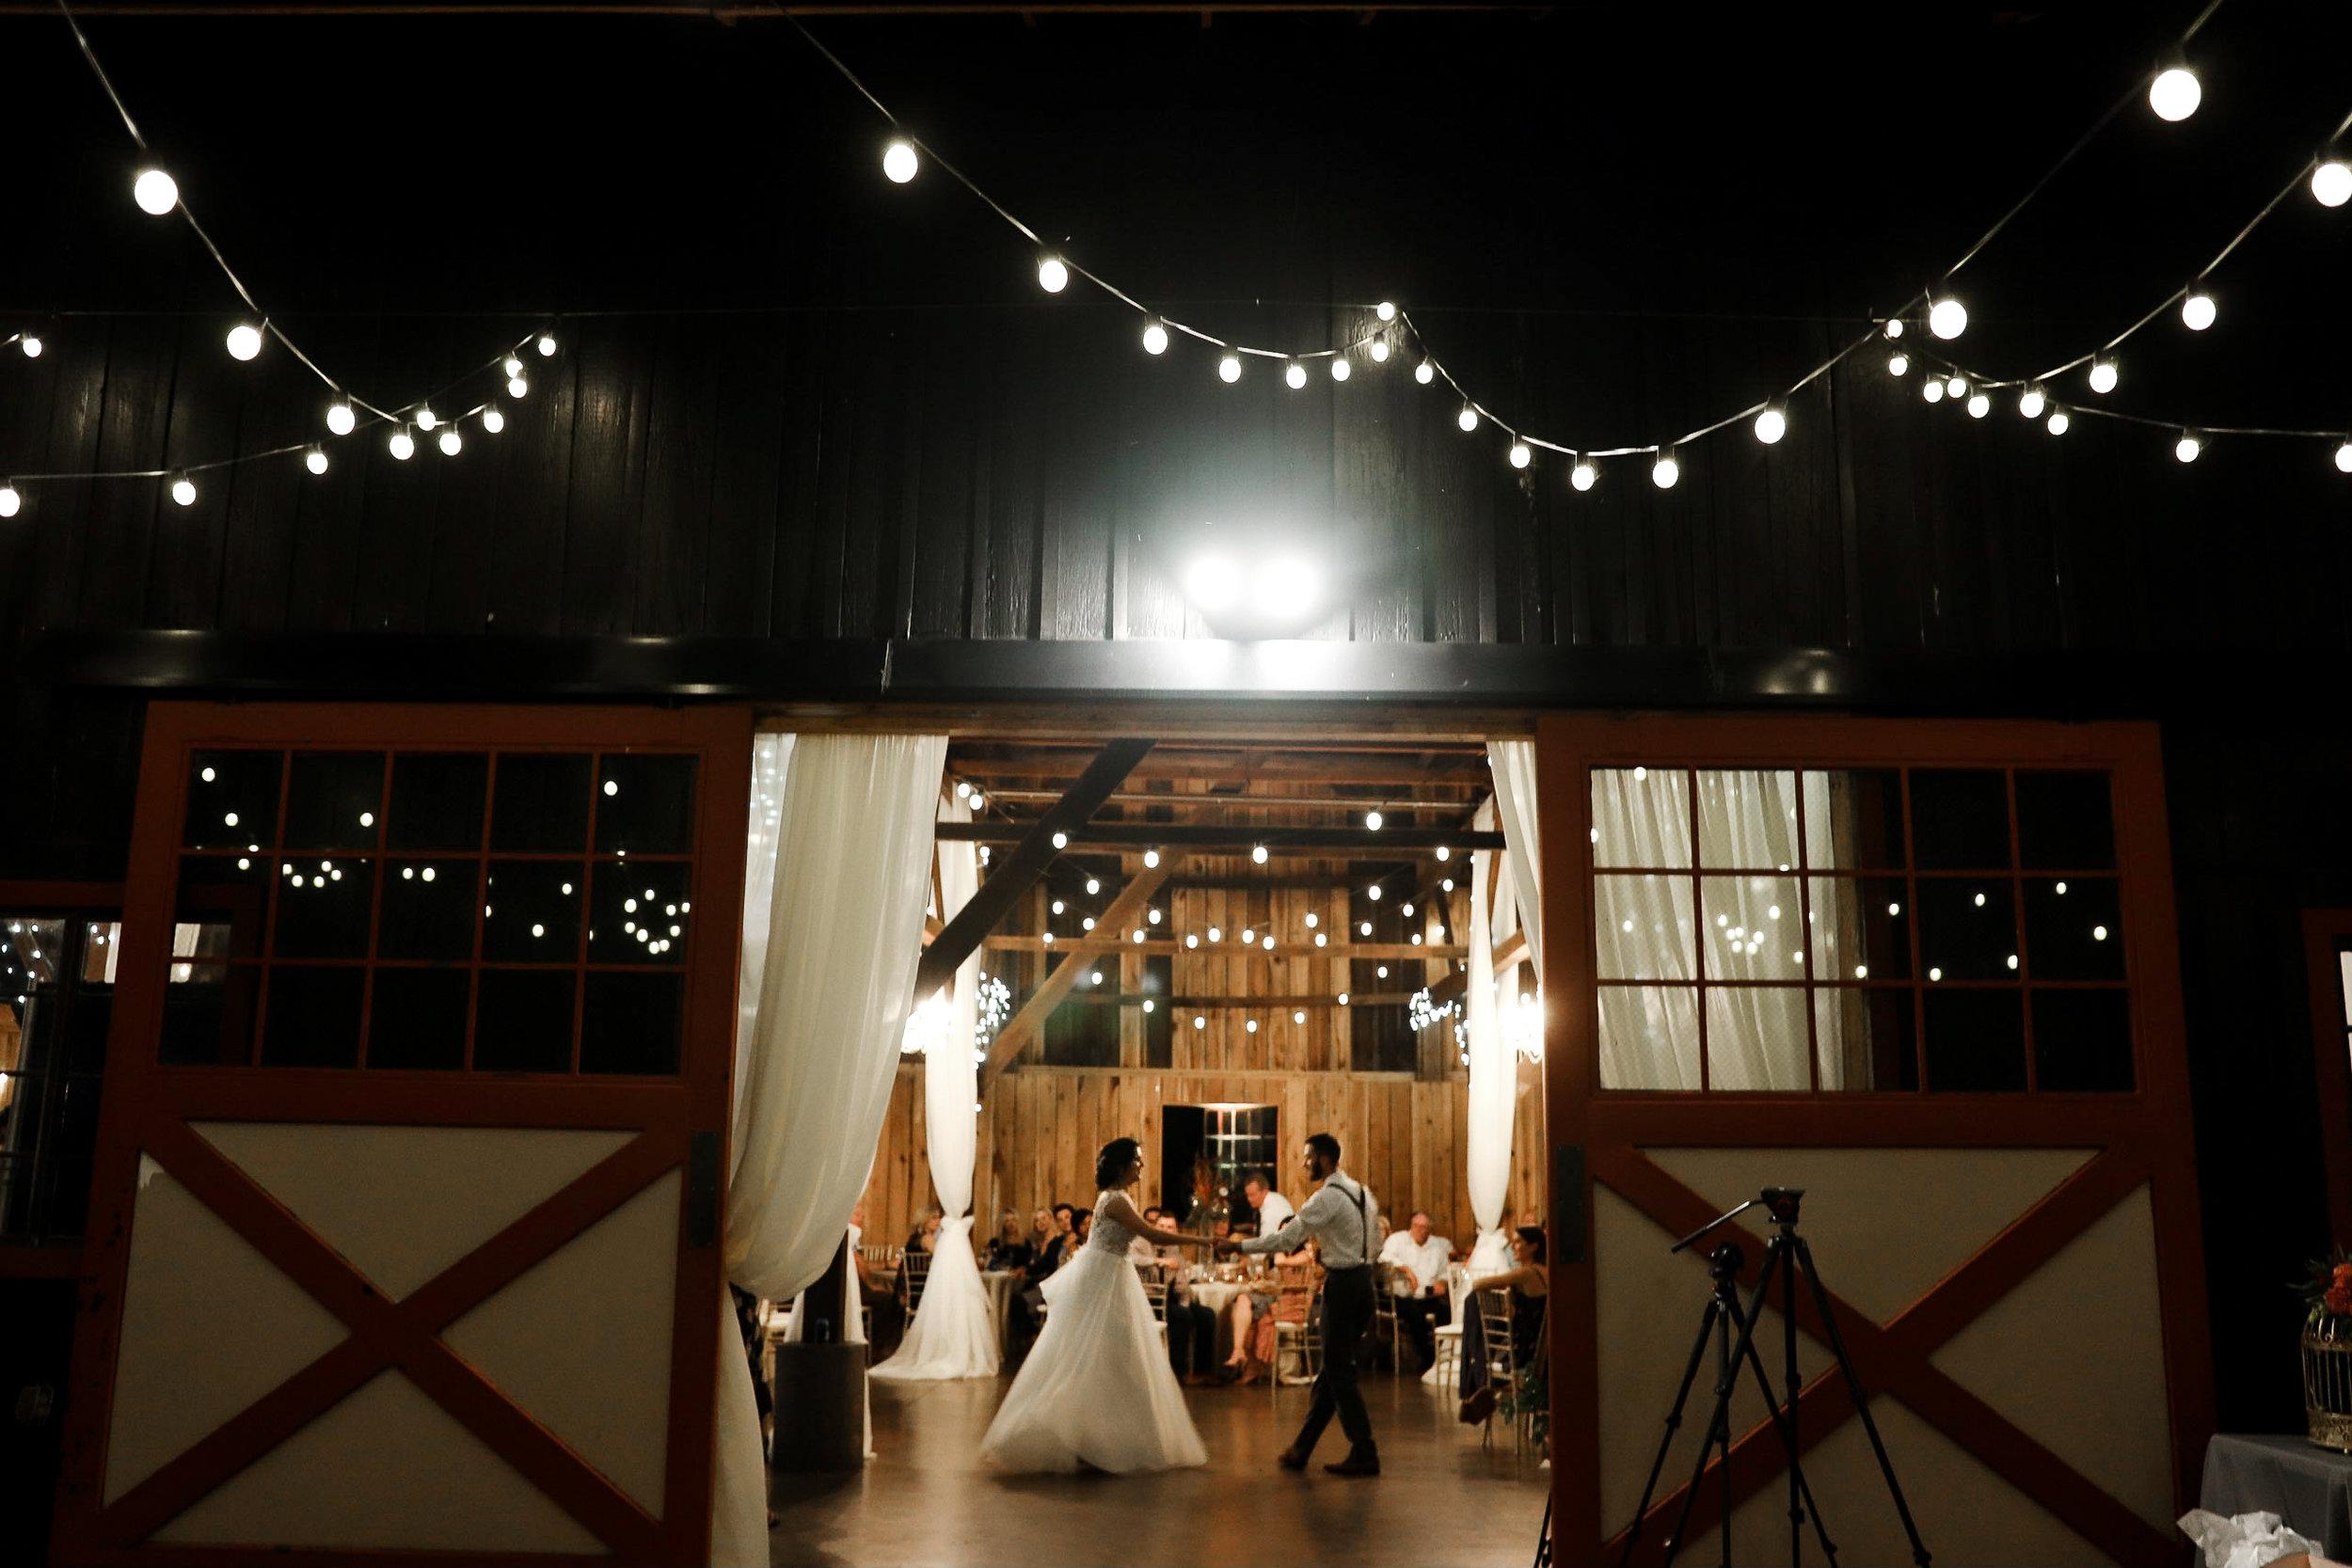 Evans-Orchard-Lexington-Kentucky-Fall-Wedding-38.jpg